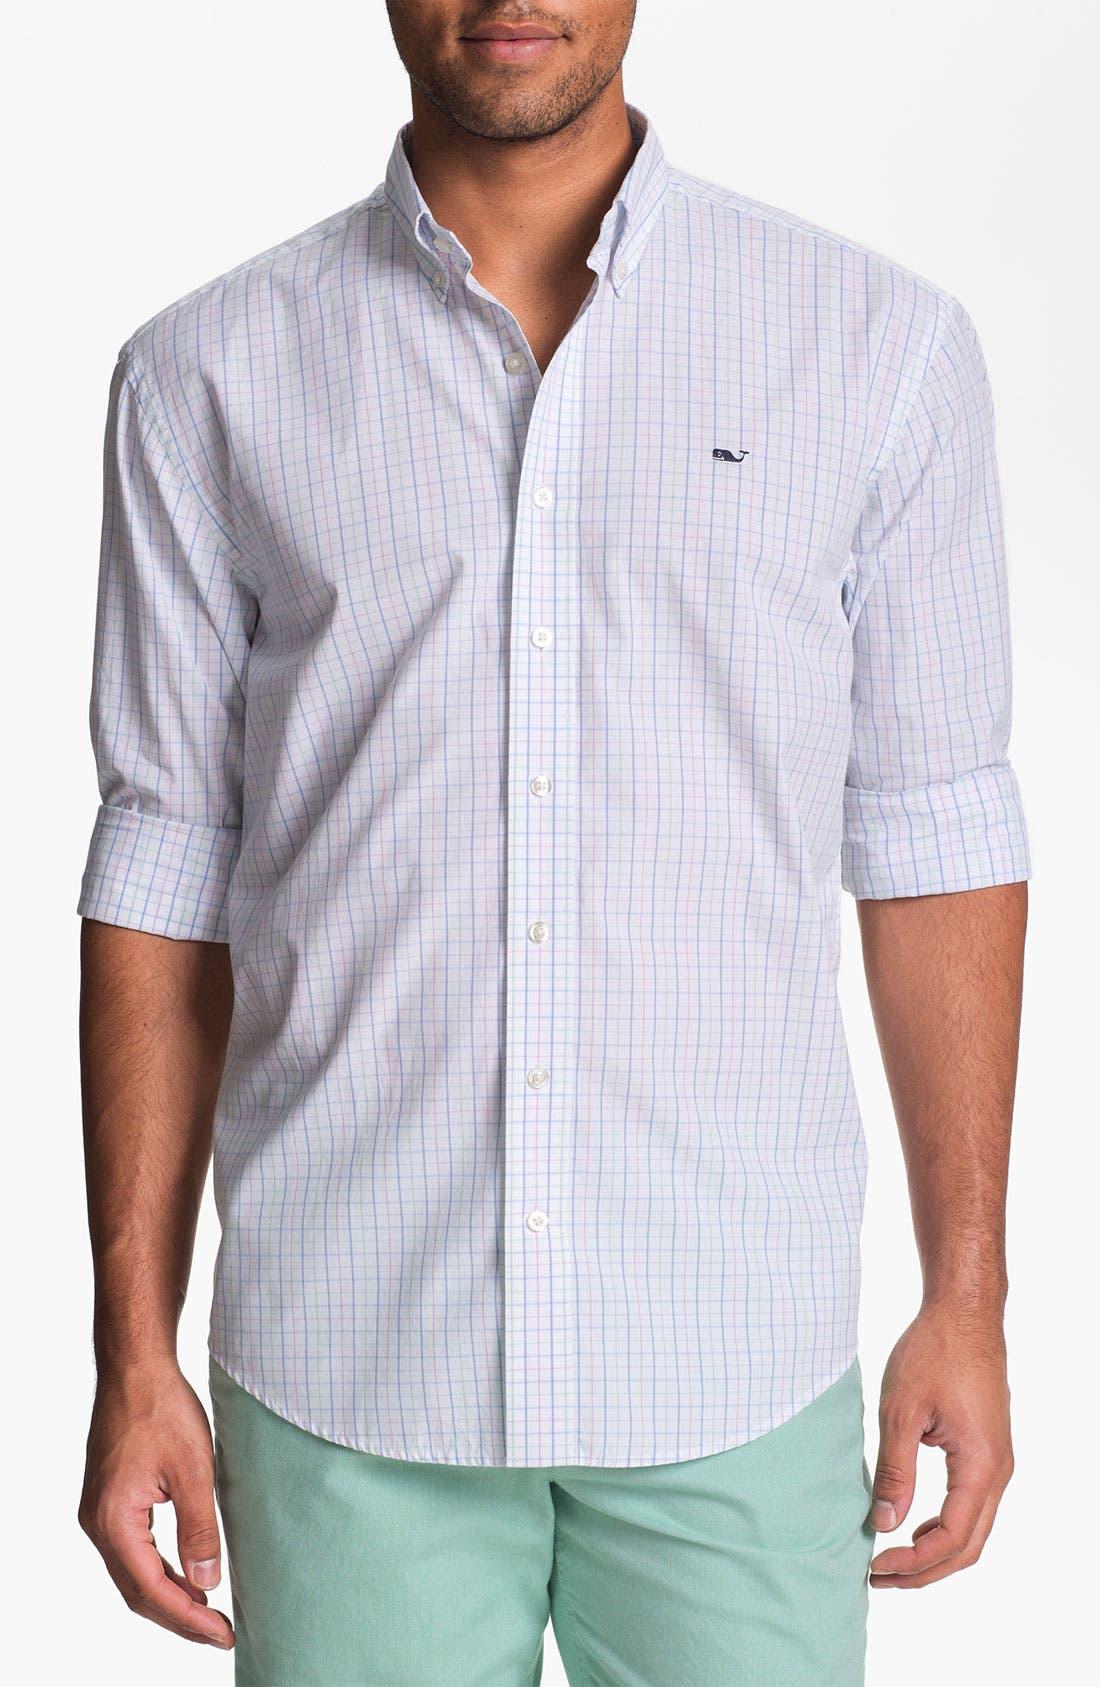 Main Image - Vineyard Vines 'Cades Bay' Regular Fit Sport Shirt